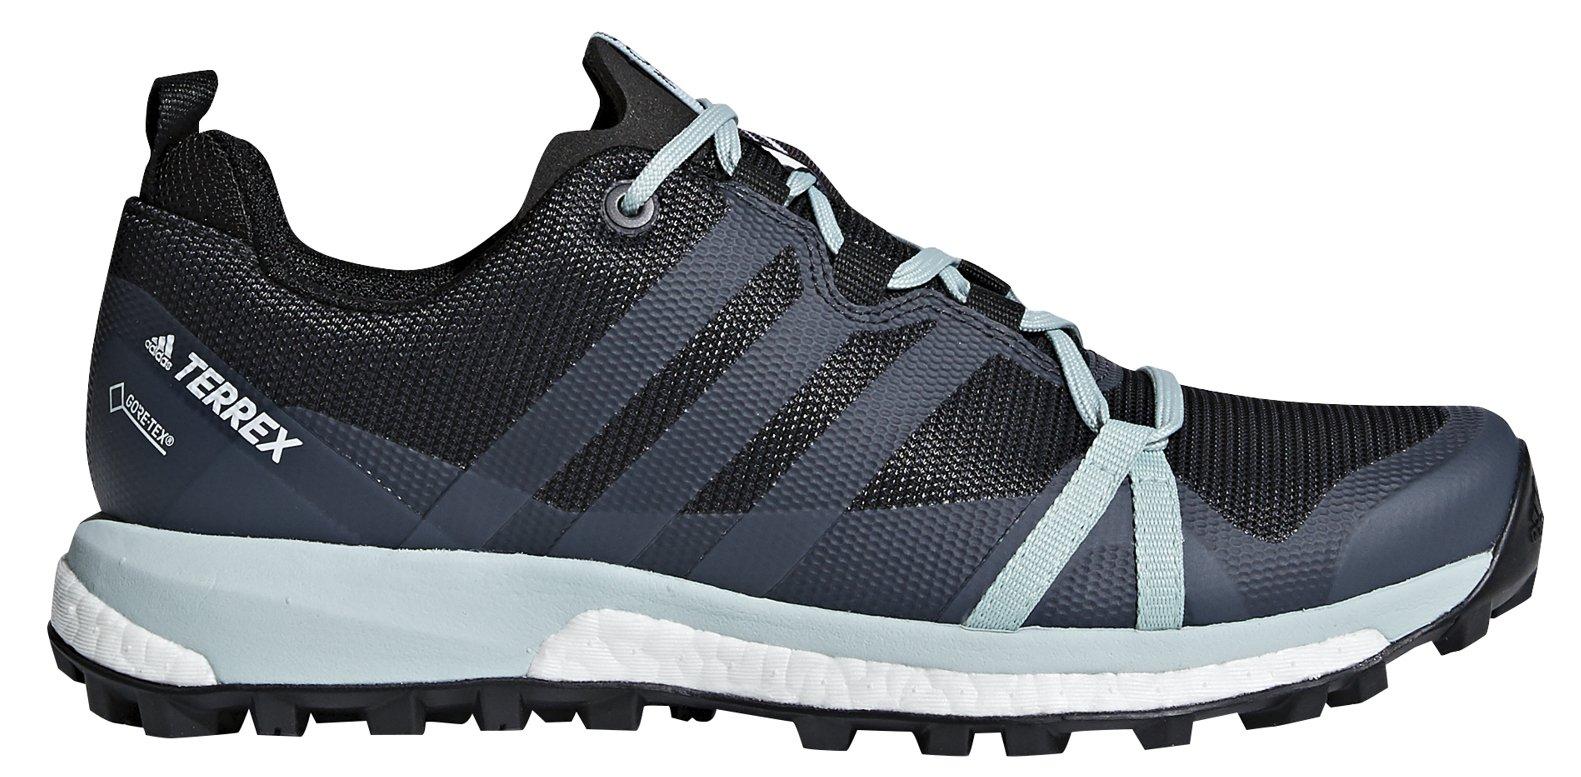 Adidas Terrex Agravic GTX 41 1/3 EUR